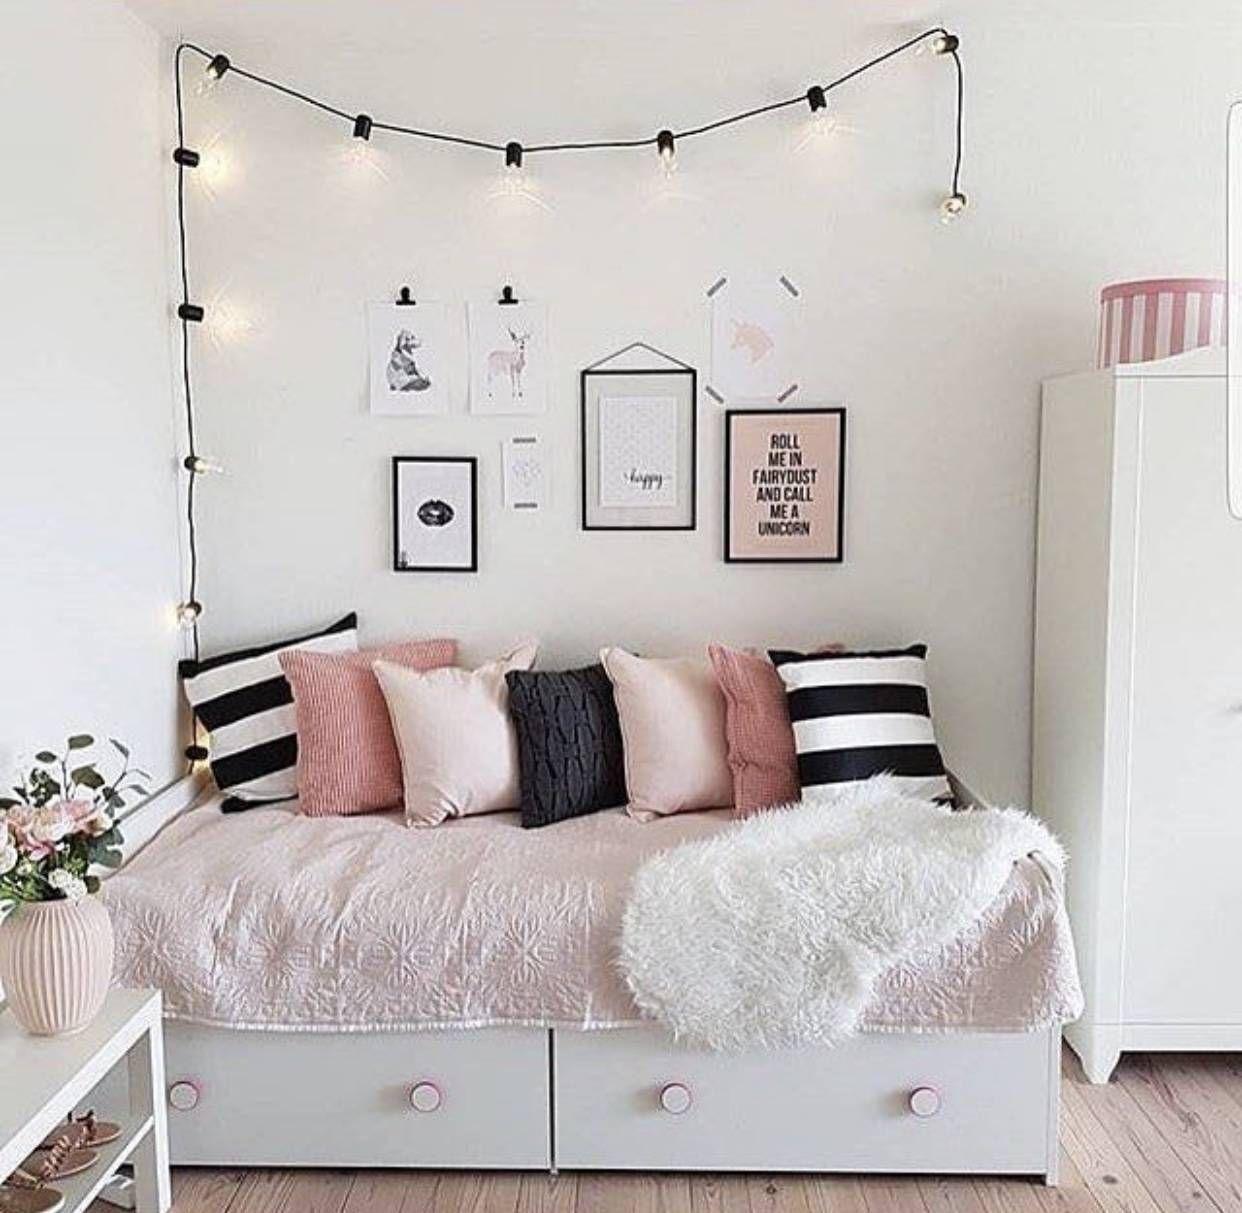 VSCO Bedroom Ideas – Tips and Tricks